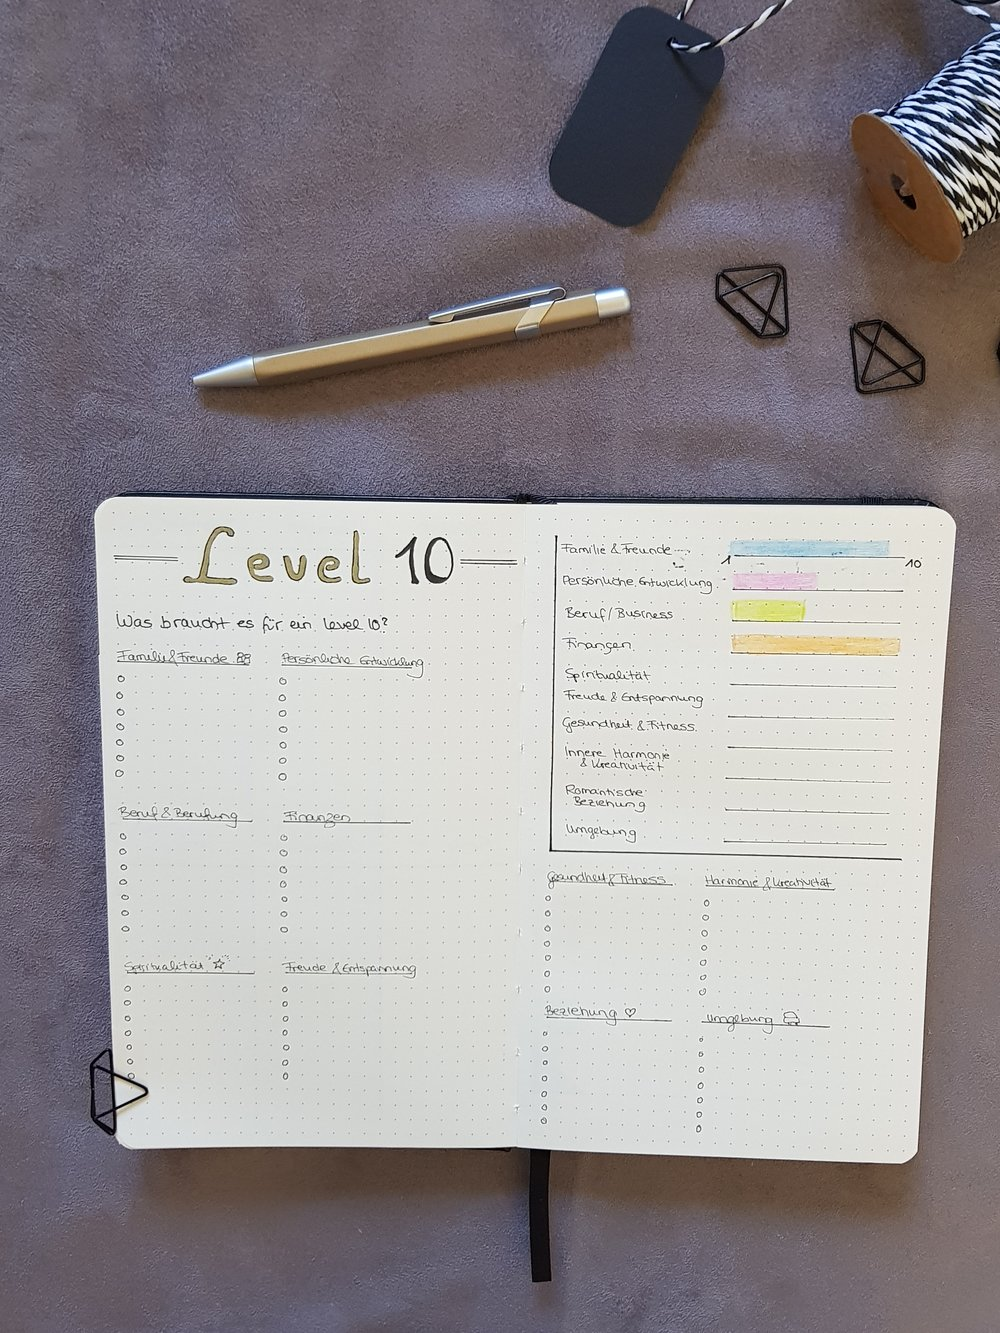 Level 10 Life Bild.jpg